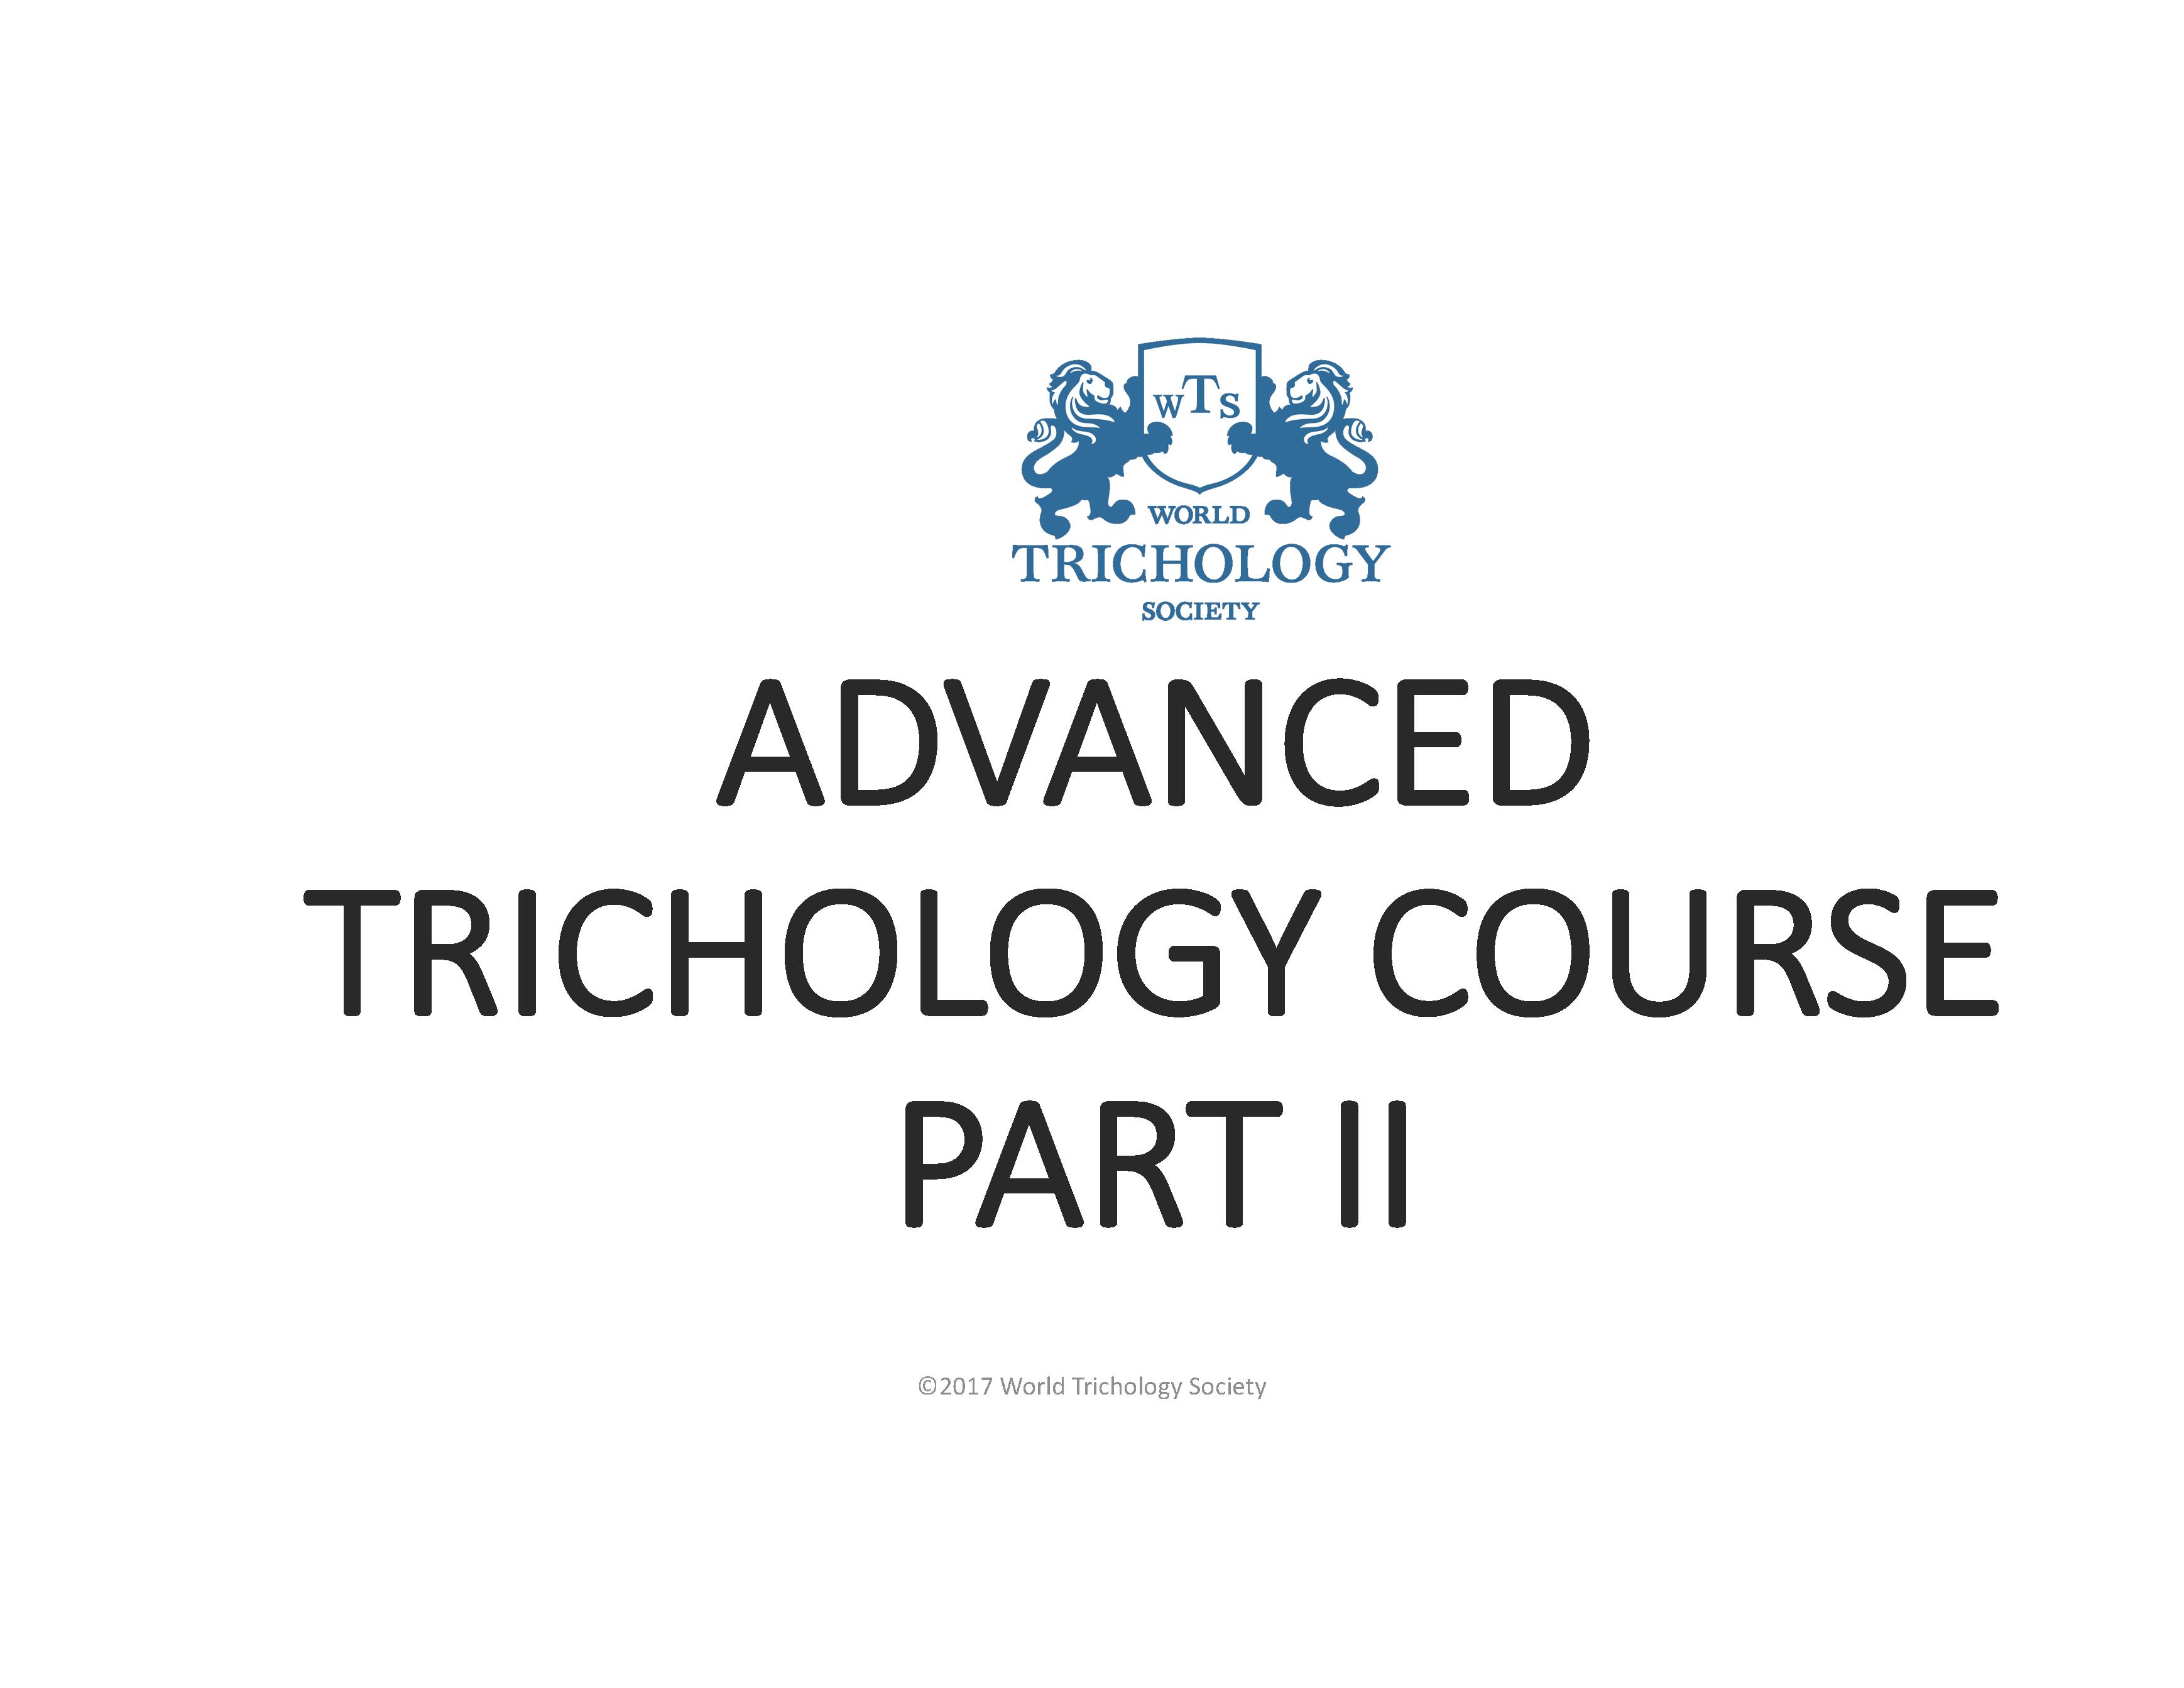 World Trichology Society Advanced Trichology Course Part II